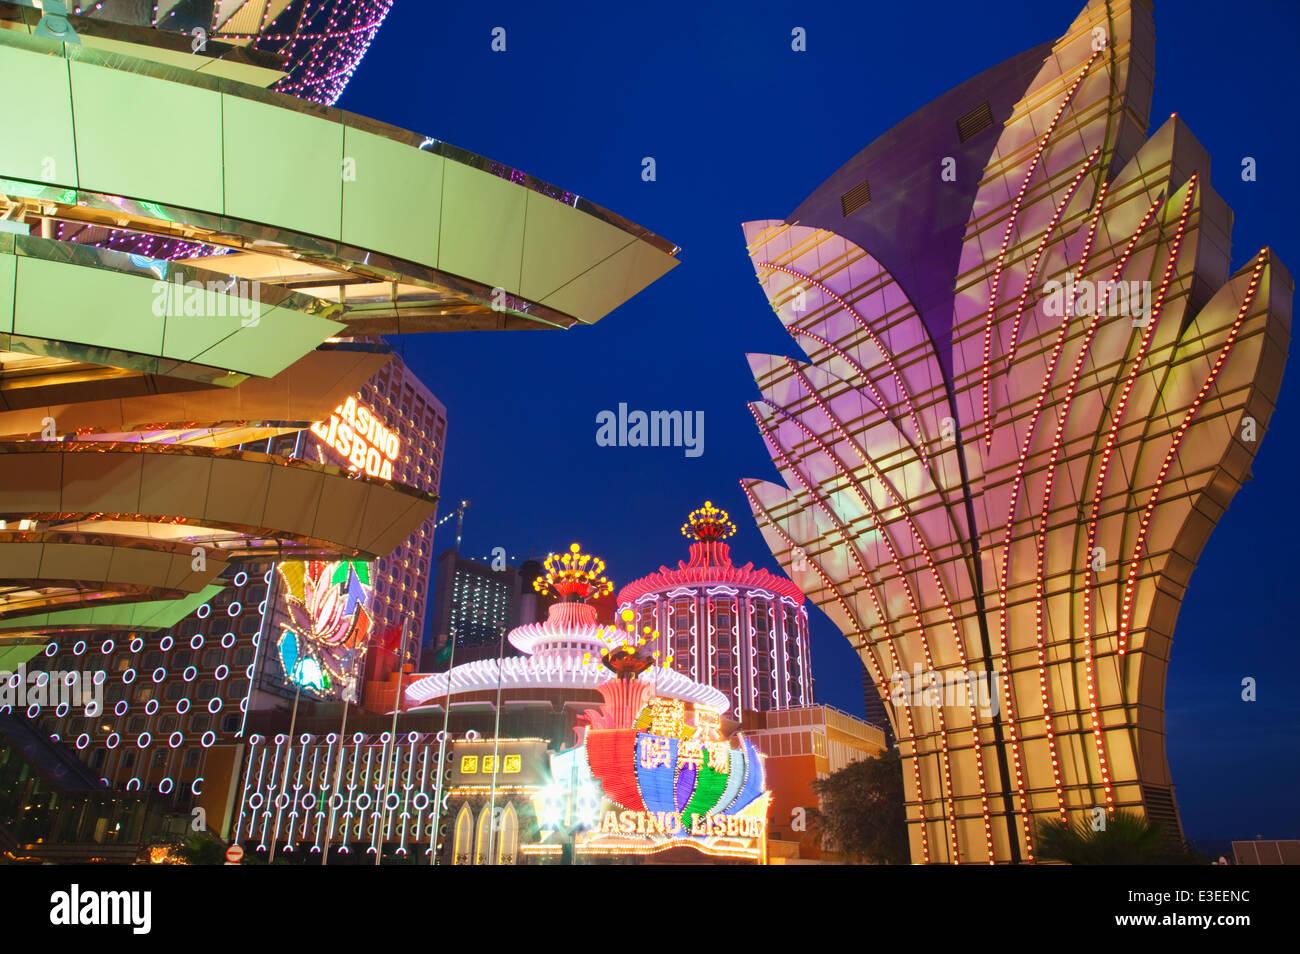 Casinos à Macao; Chine; de nuit Photo Stock